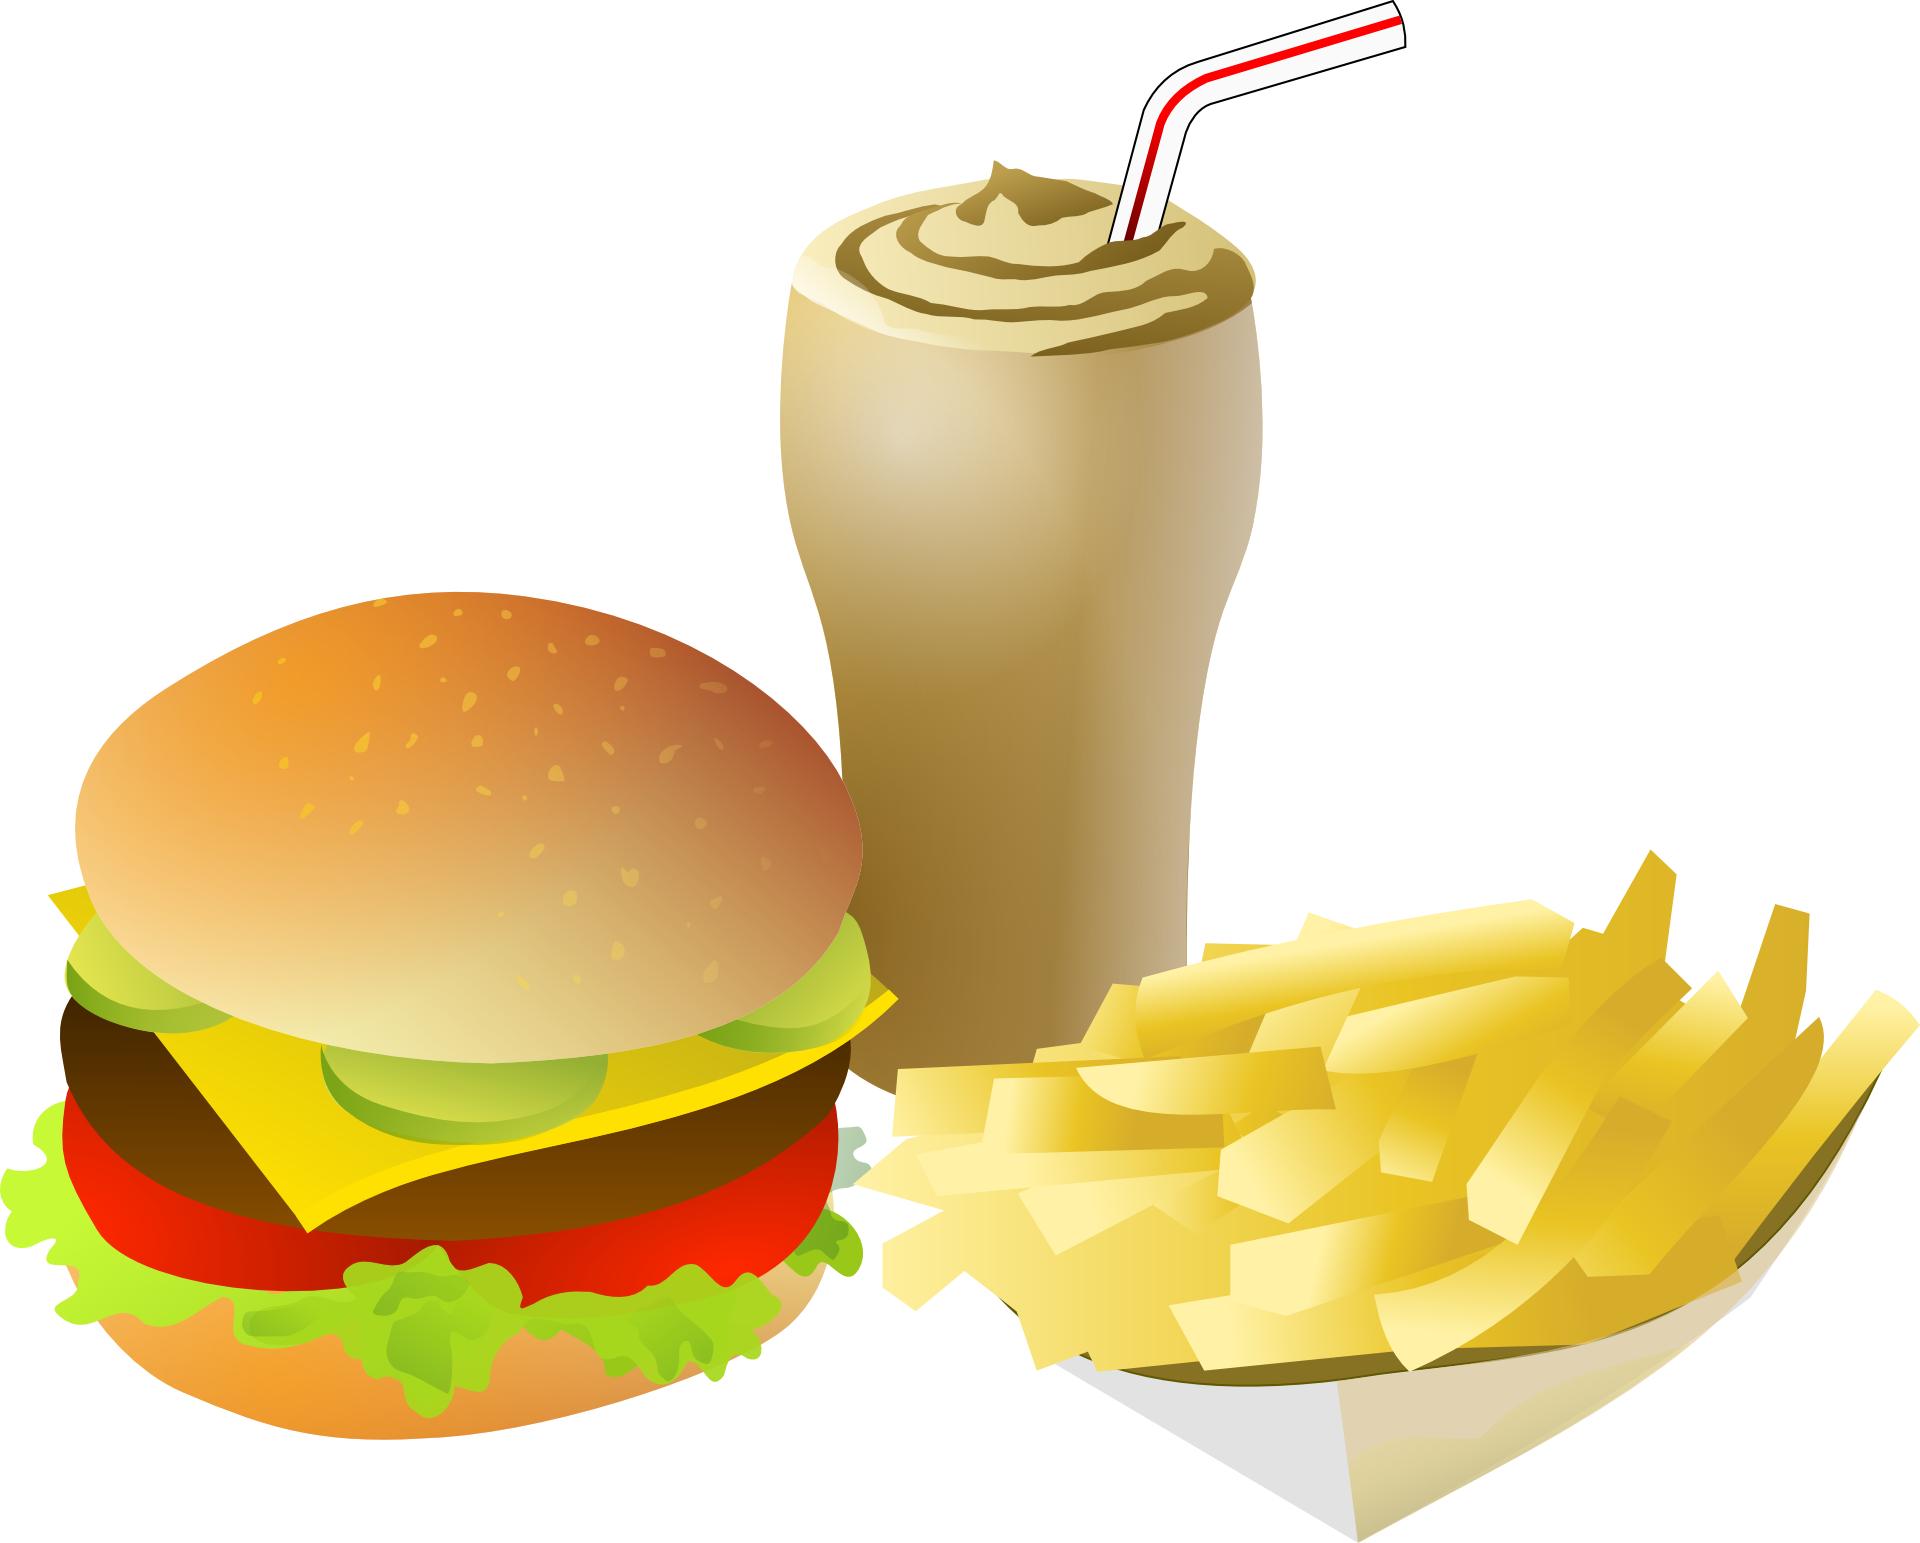 orange-yellow fries,drink,hamburger,delicious food